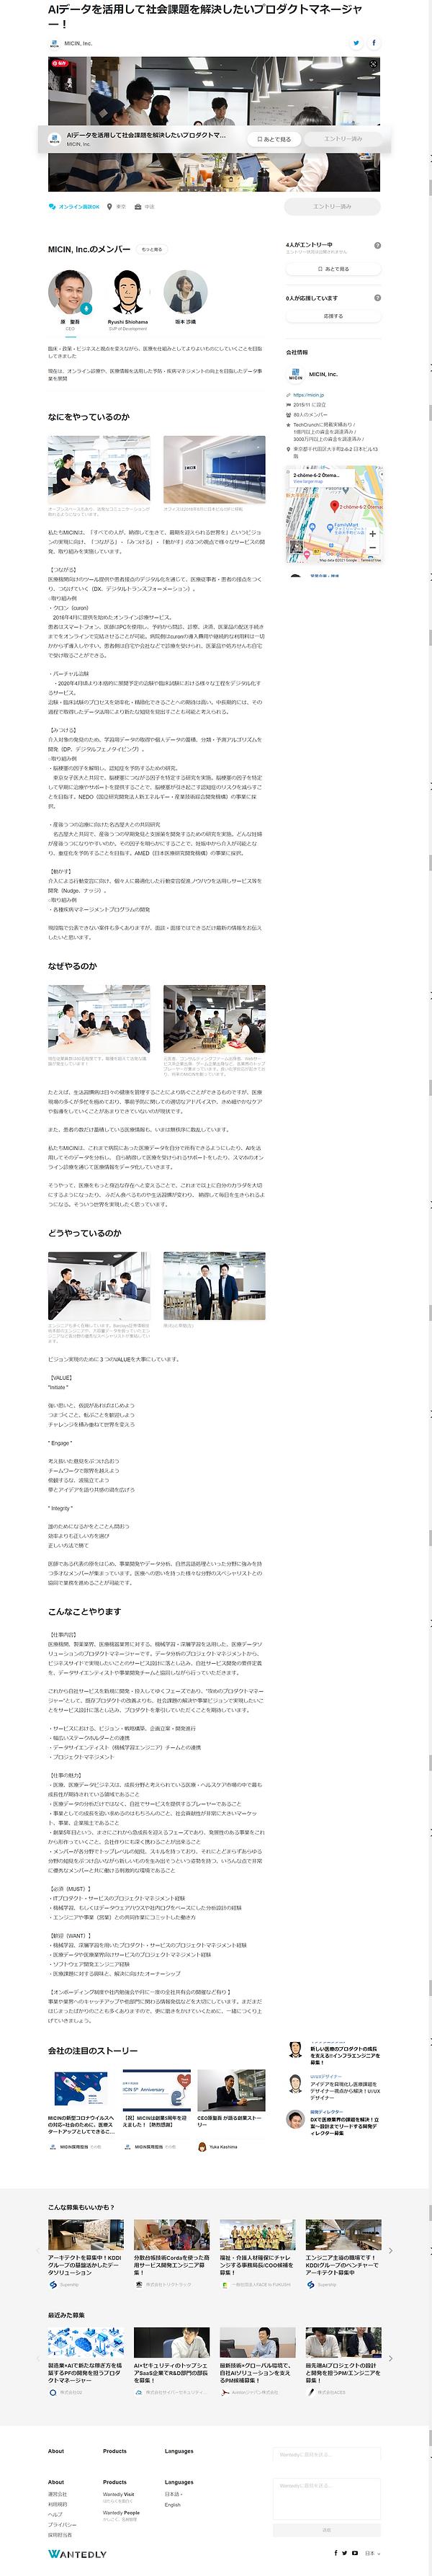 Screenshot (46).png